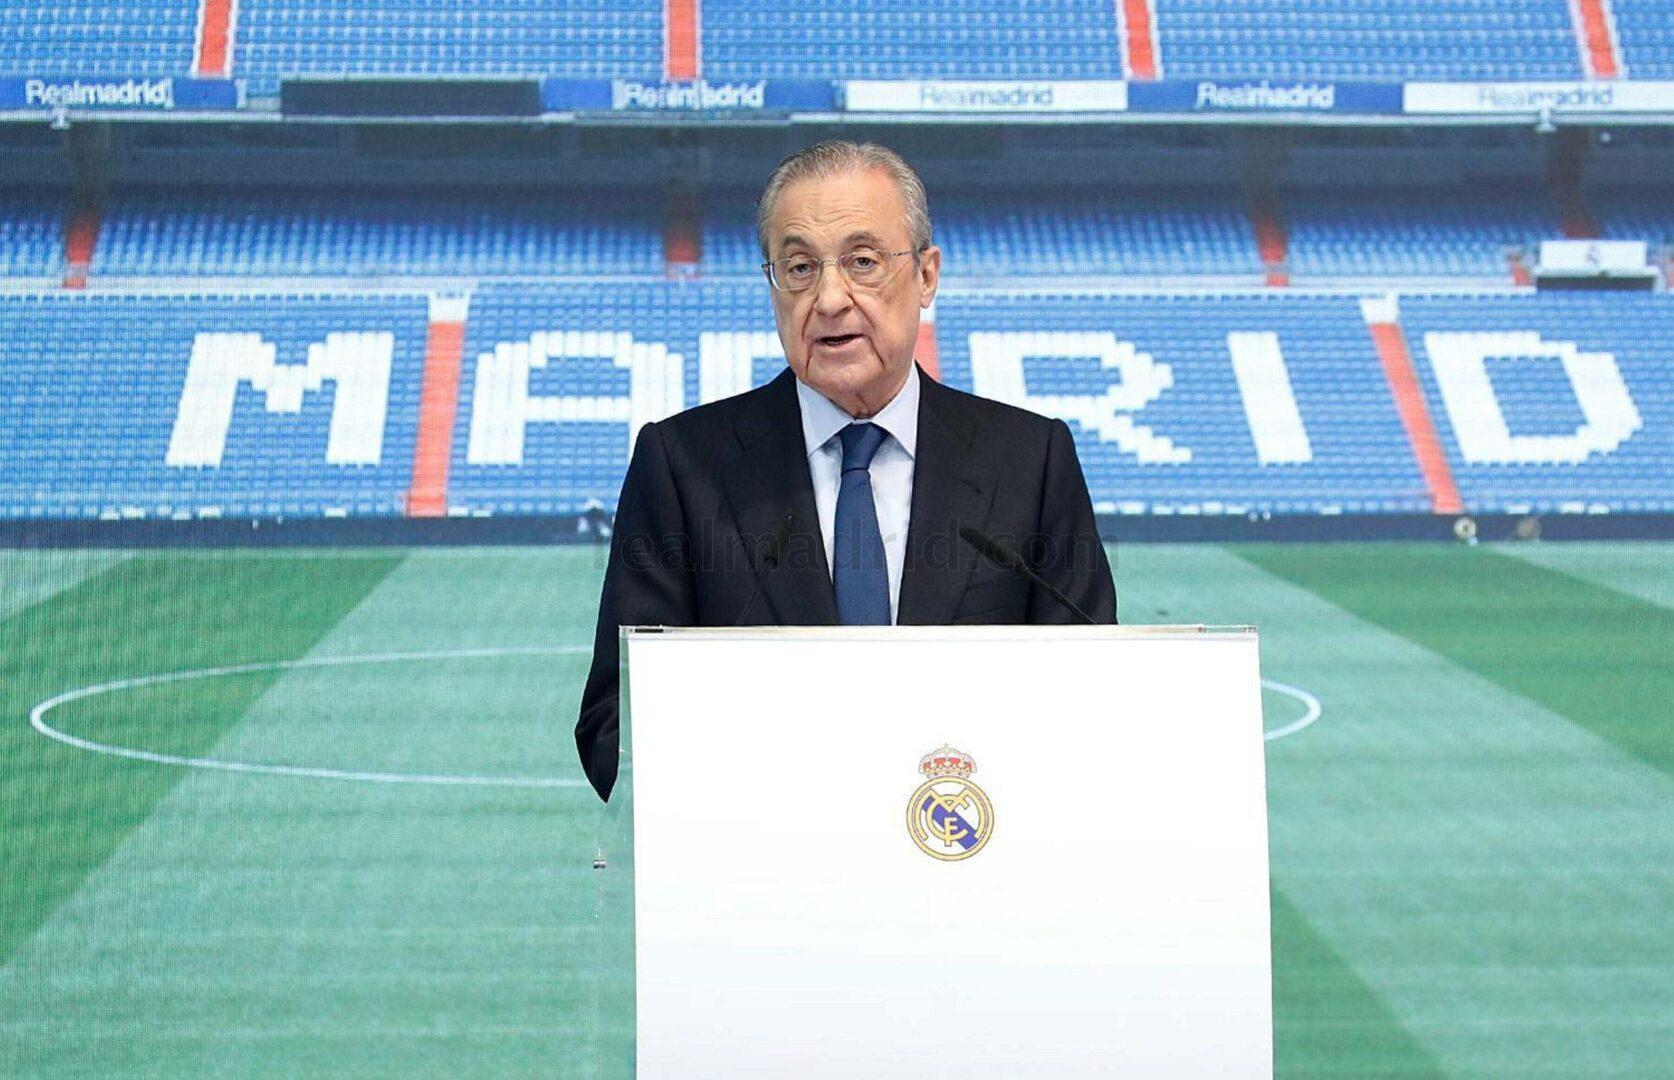 Real Madrid | Eklat um Pérez: Fragwürdige Äußerungen über Klublegenden